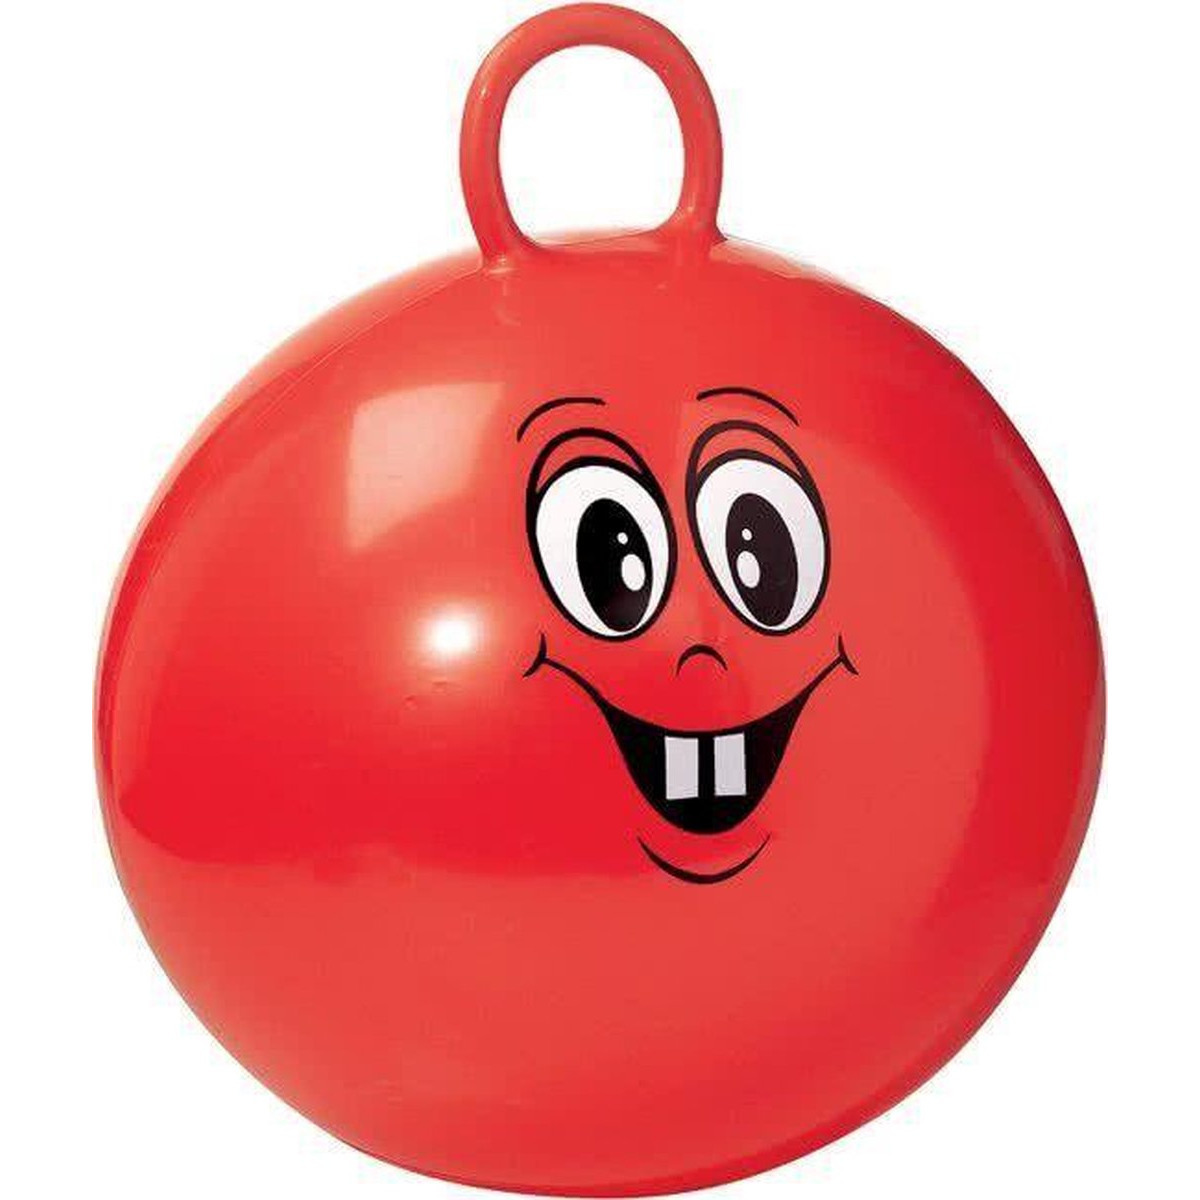 Gekleurde skippybal 50 cm